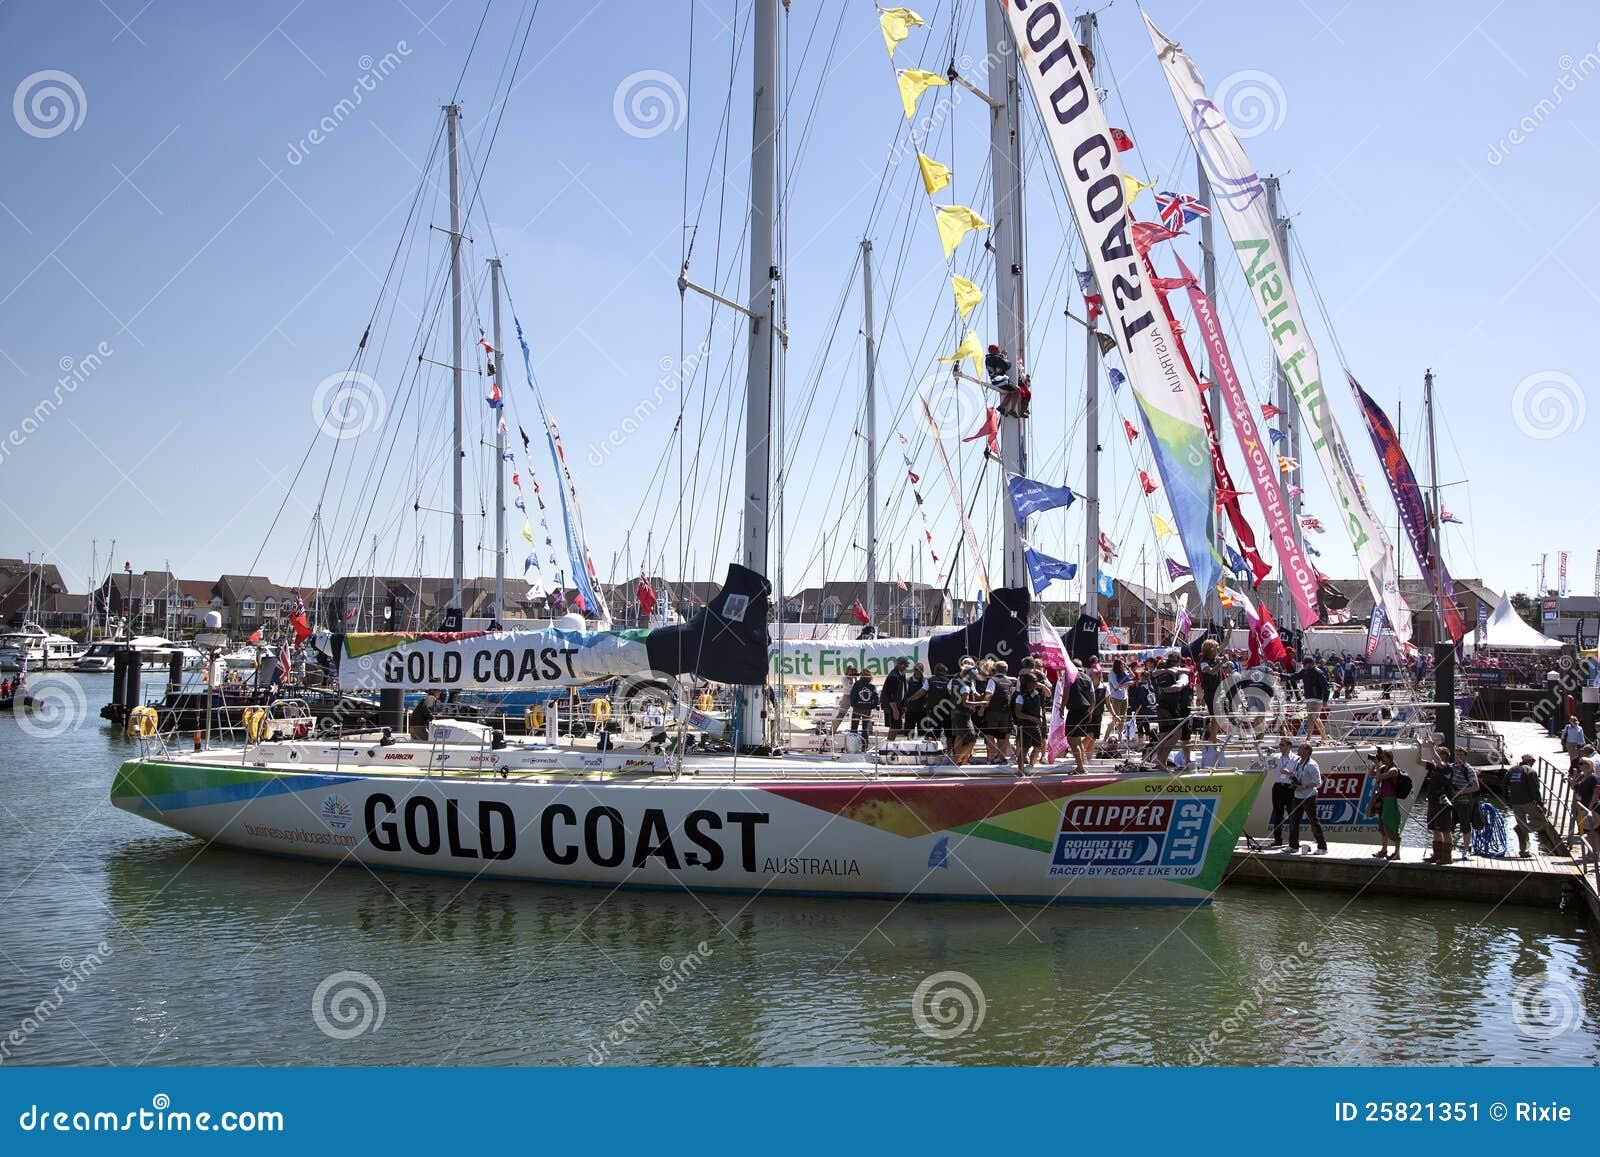 Shockwave40: Rothmans - Maxi IOR Yacht - Whitbread Round